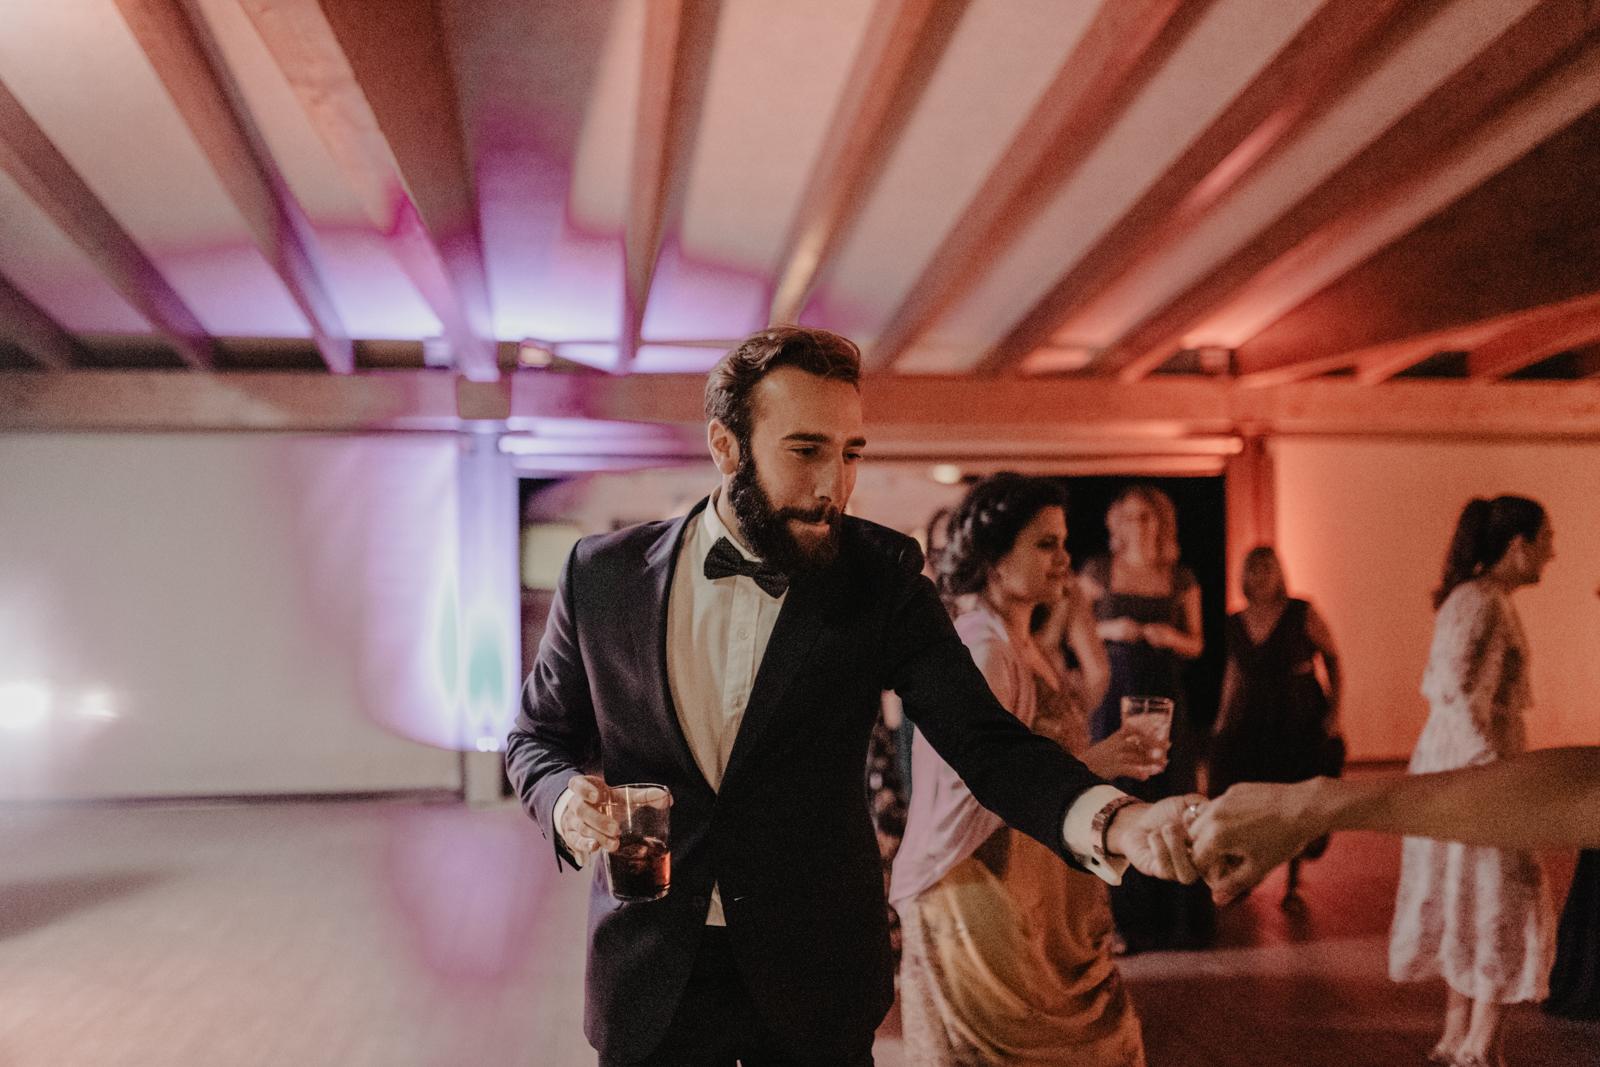 thenortherngirlphotography_photography_thenortherngirl_rebeccascabros_wedding_weddingphotography_weddingphotographer_barcelona_bodaenbarcelona_bodaenmaselmarti_bodarogeryvane-1057.jpg